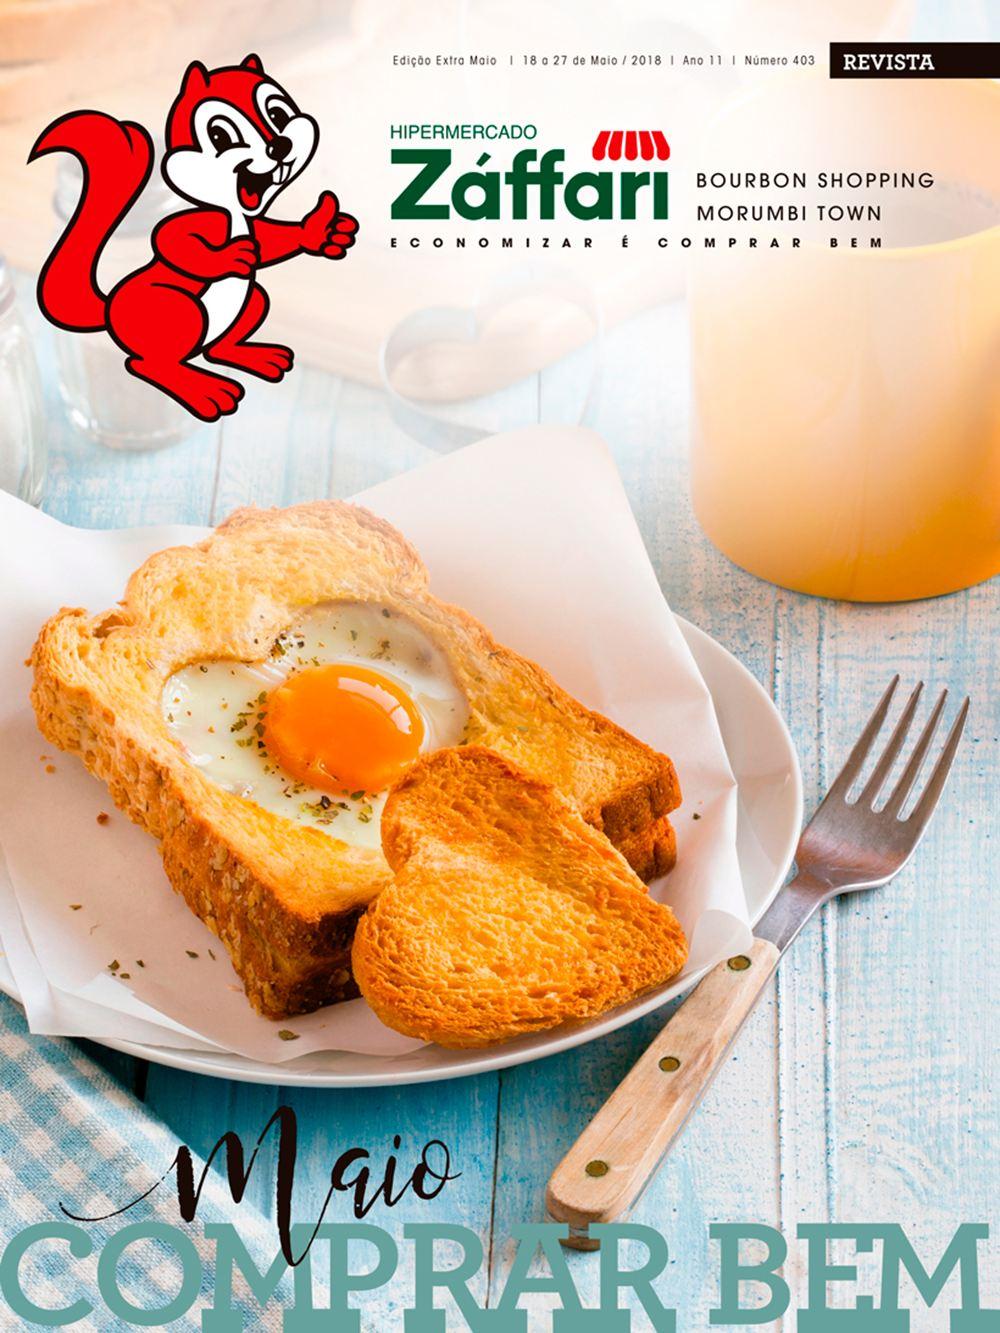 Ofertas-zaffari1-1 Zaffari até 27/05